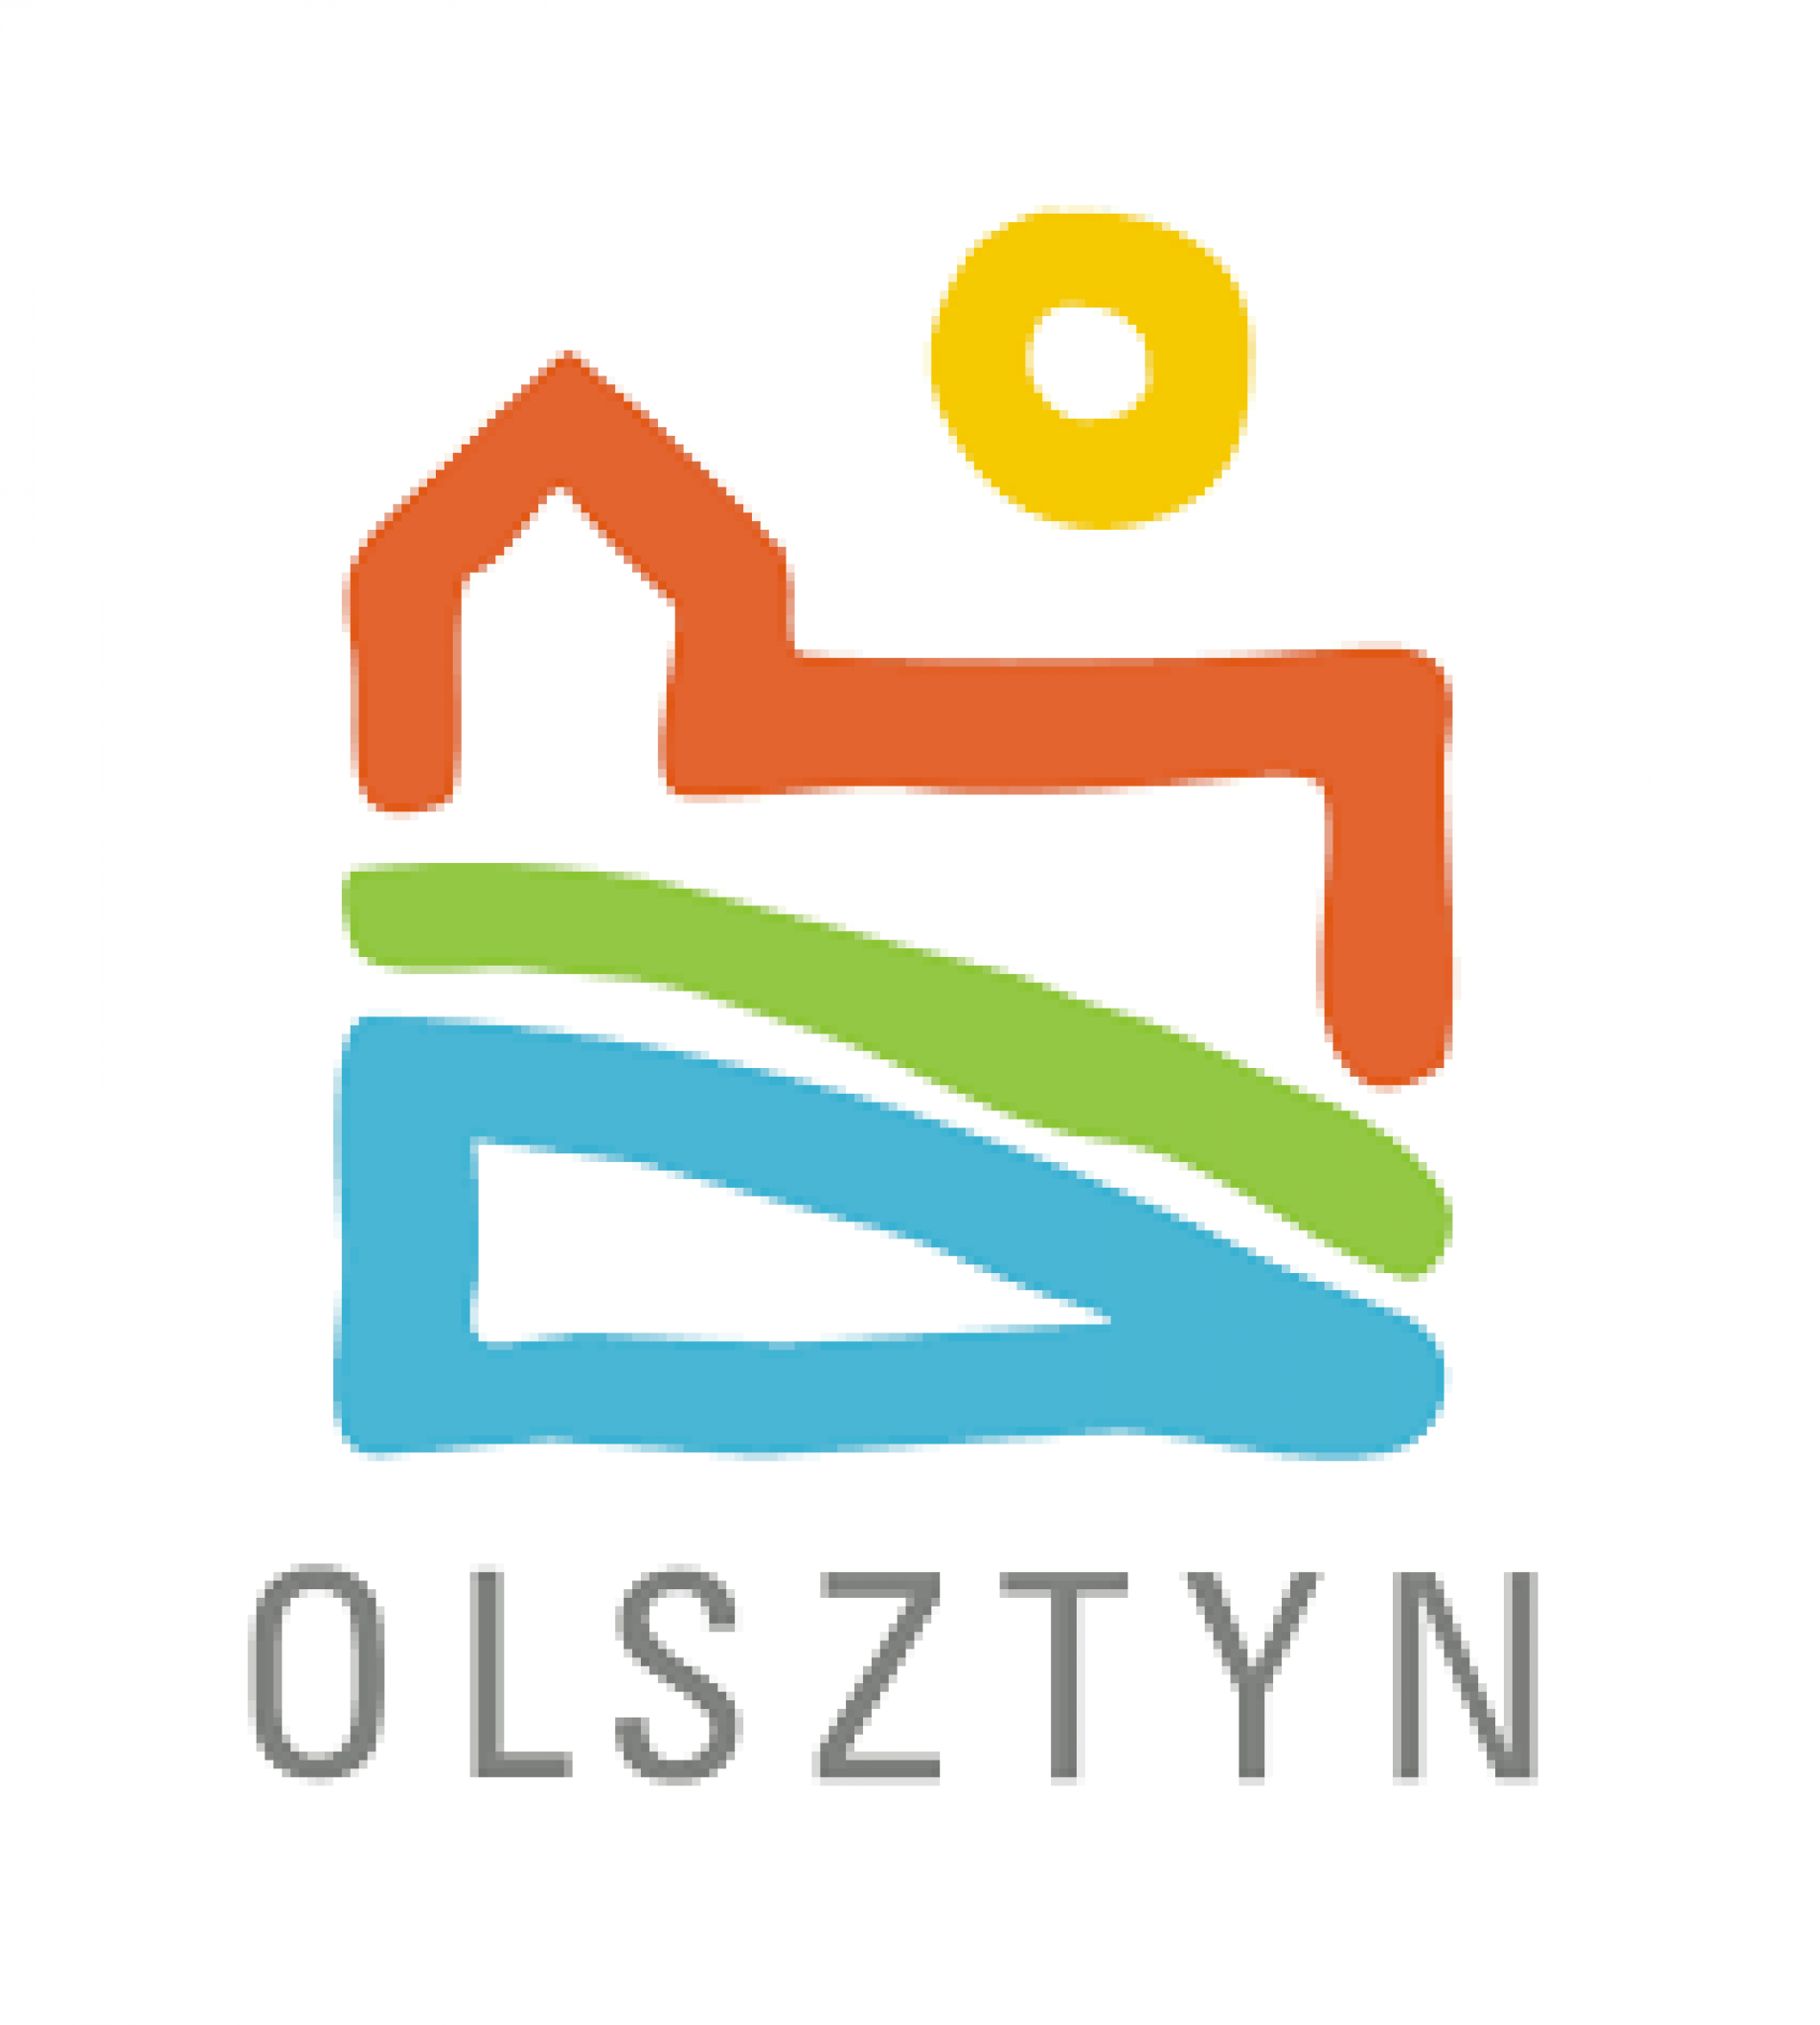 Olsztyn w sieci Use – It